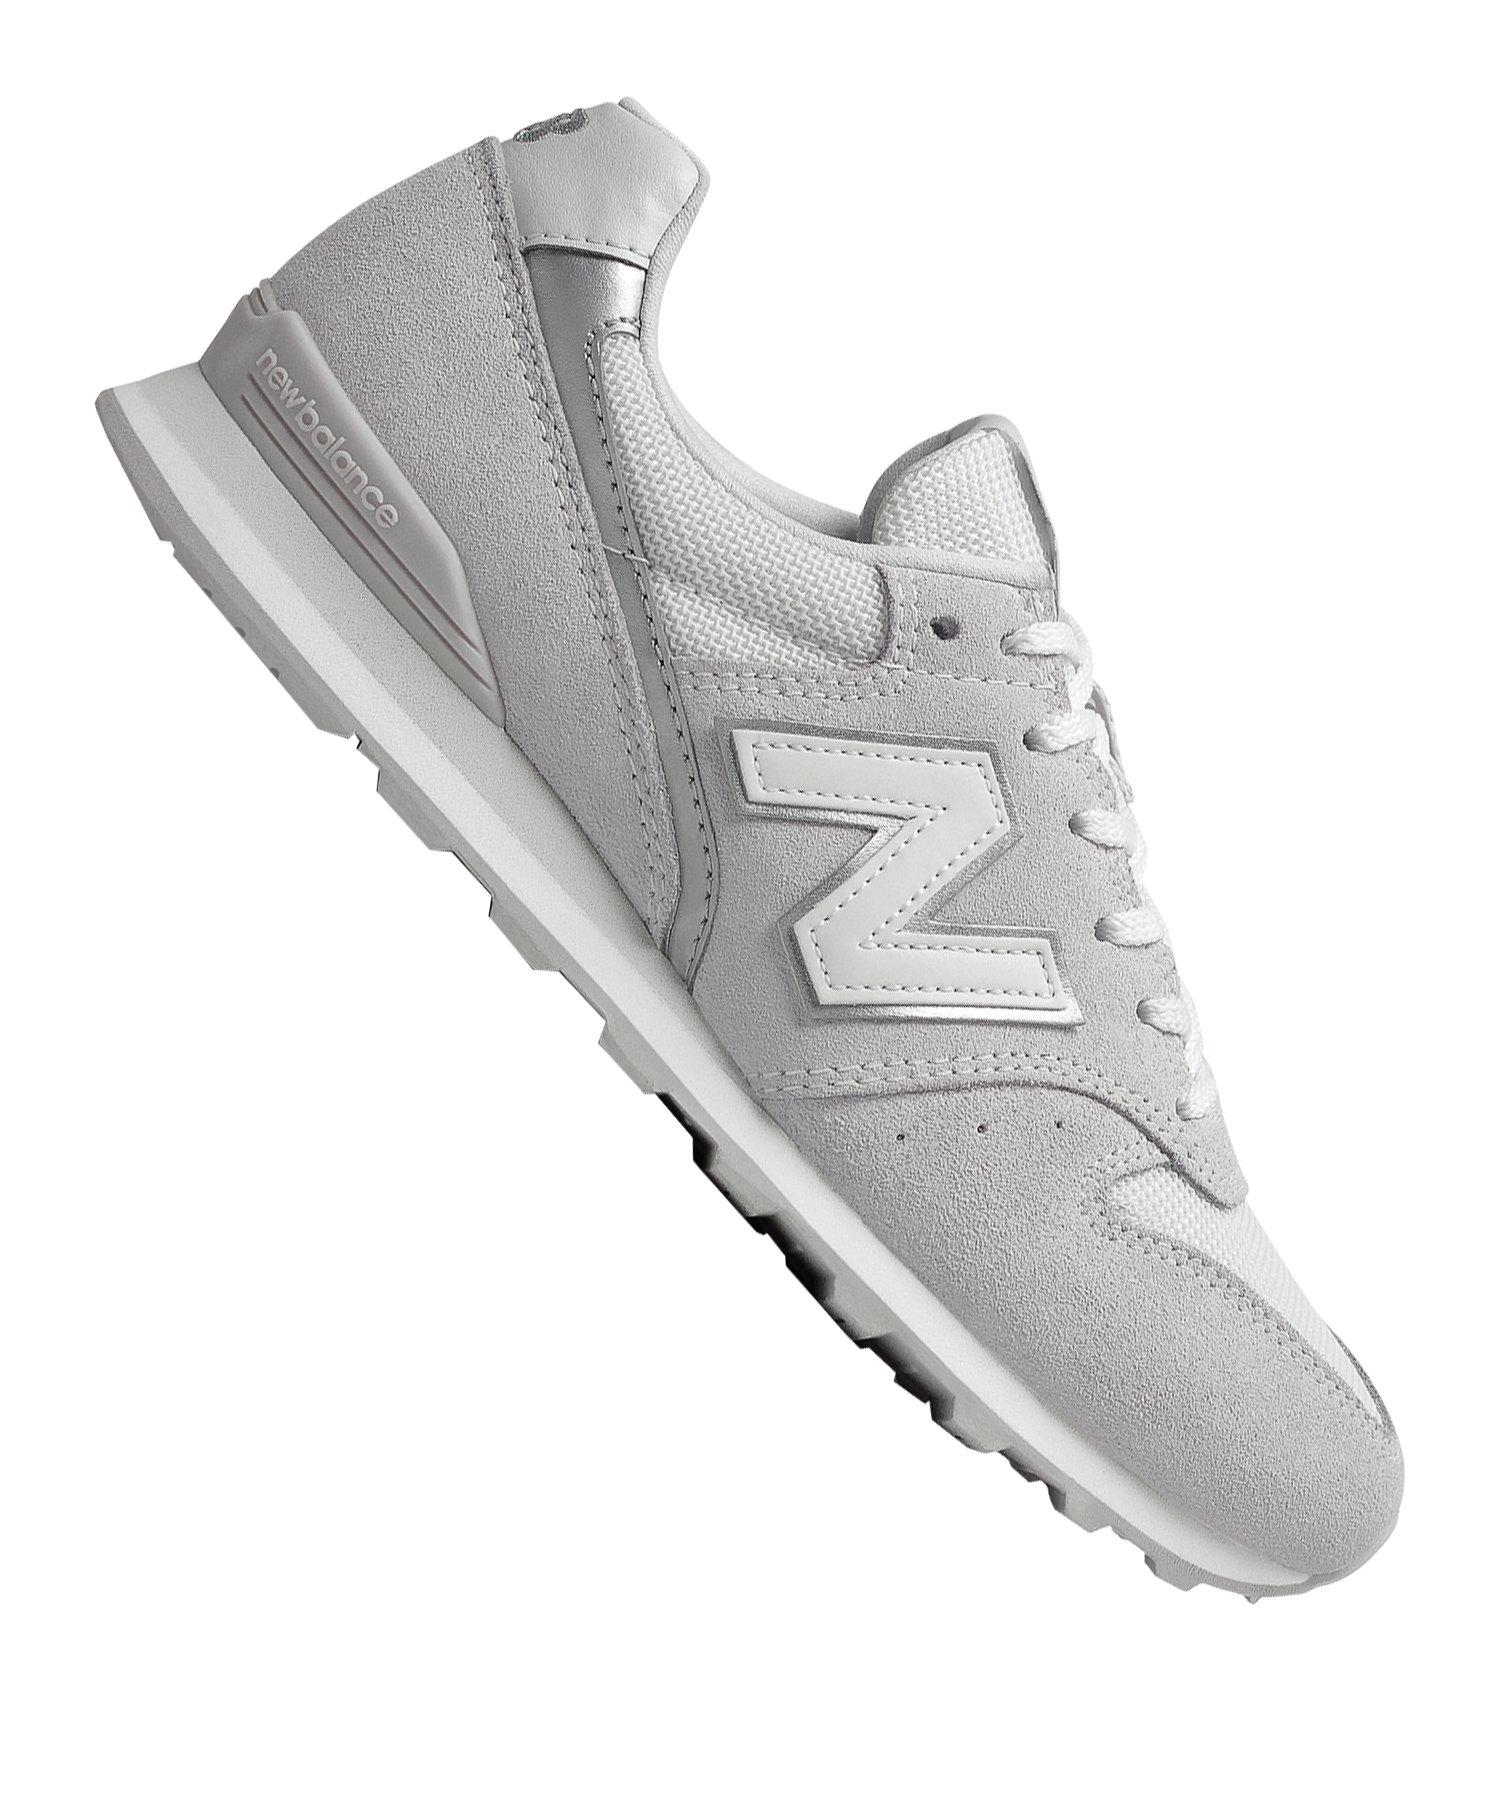 New Balance WL996 B Sneaker Damen Grau F11 - grau